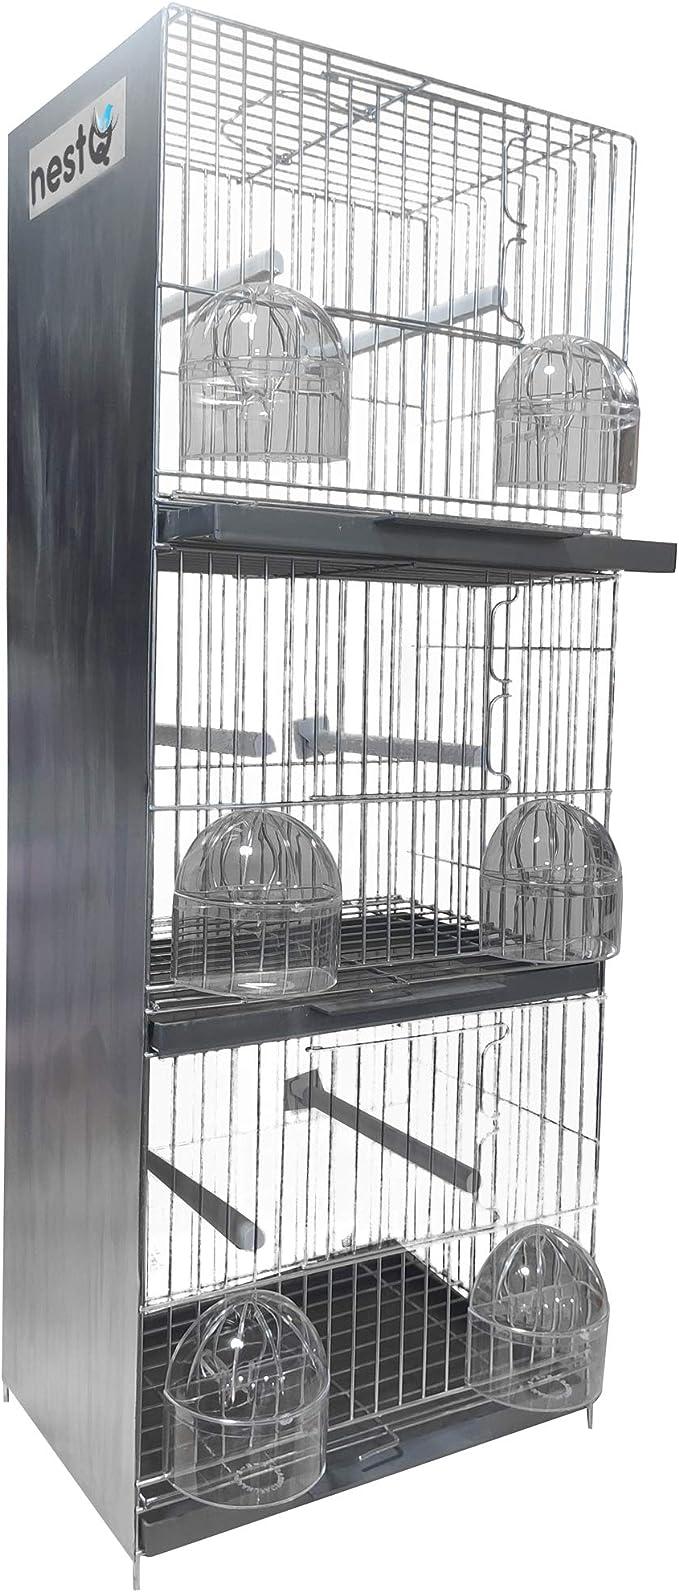 nestQ Jaula Triple Pajaros en Disposición de Tres Niveles en Vertical para Canarios Jilgueros Verderones Aves Silvestres Exotico Tropicales